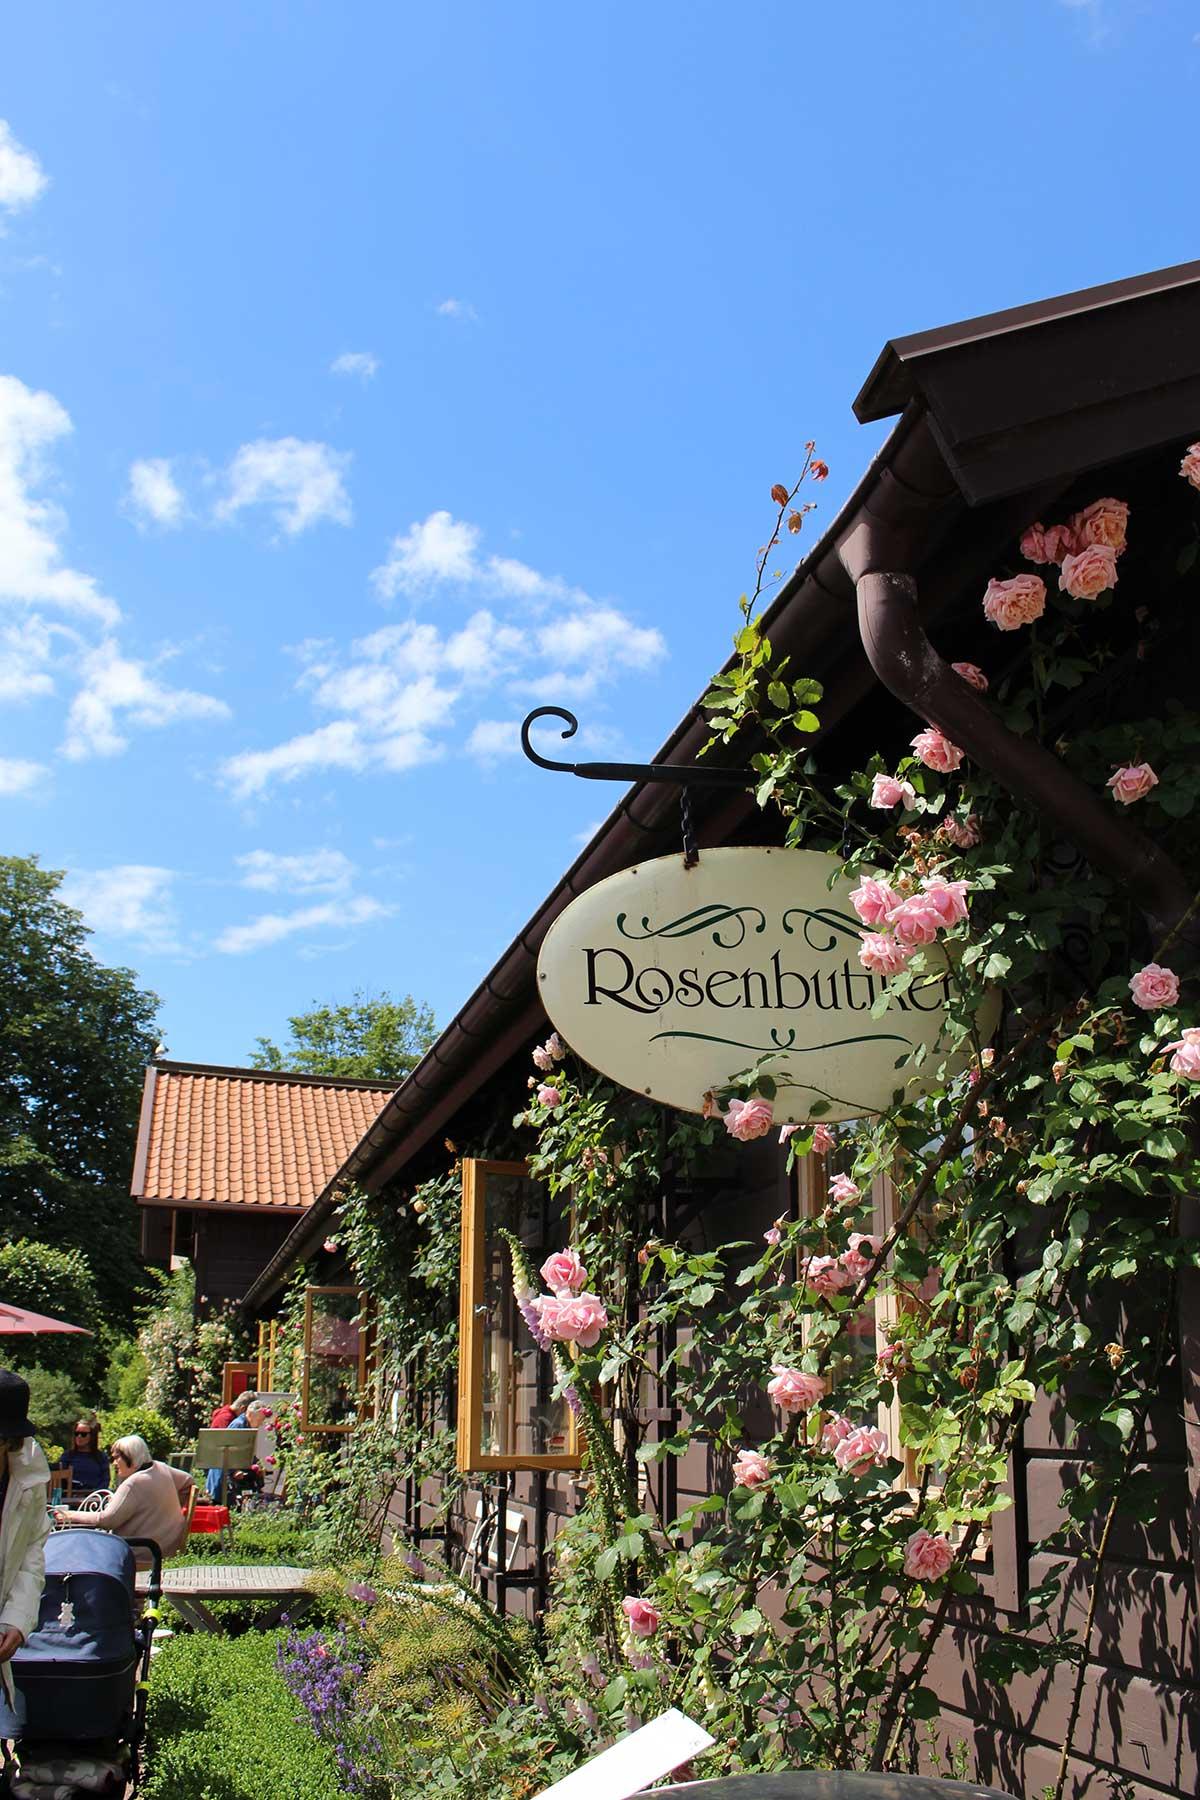 rosenbutiken-garden-society